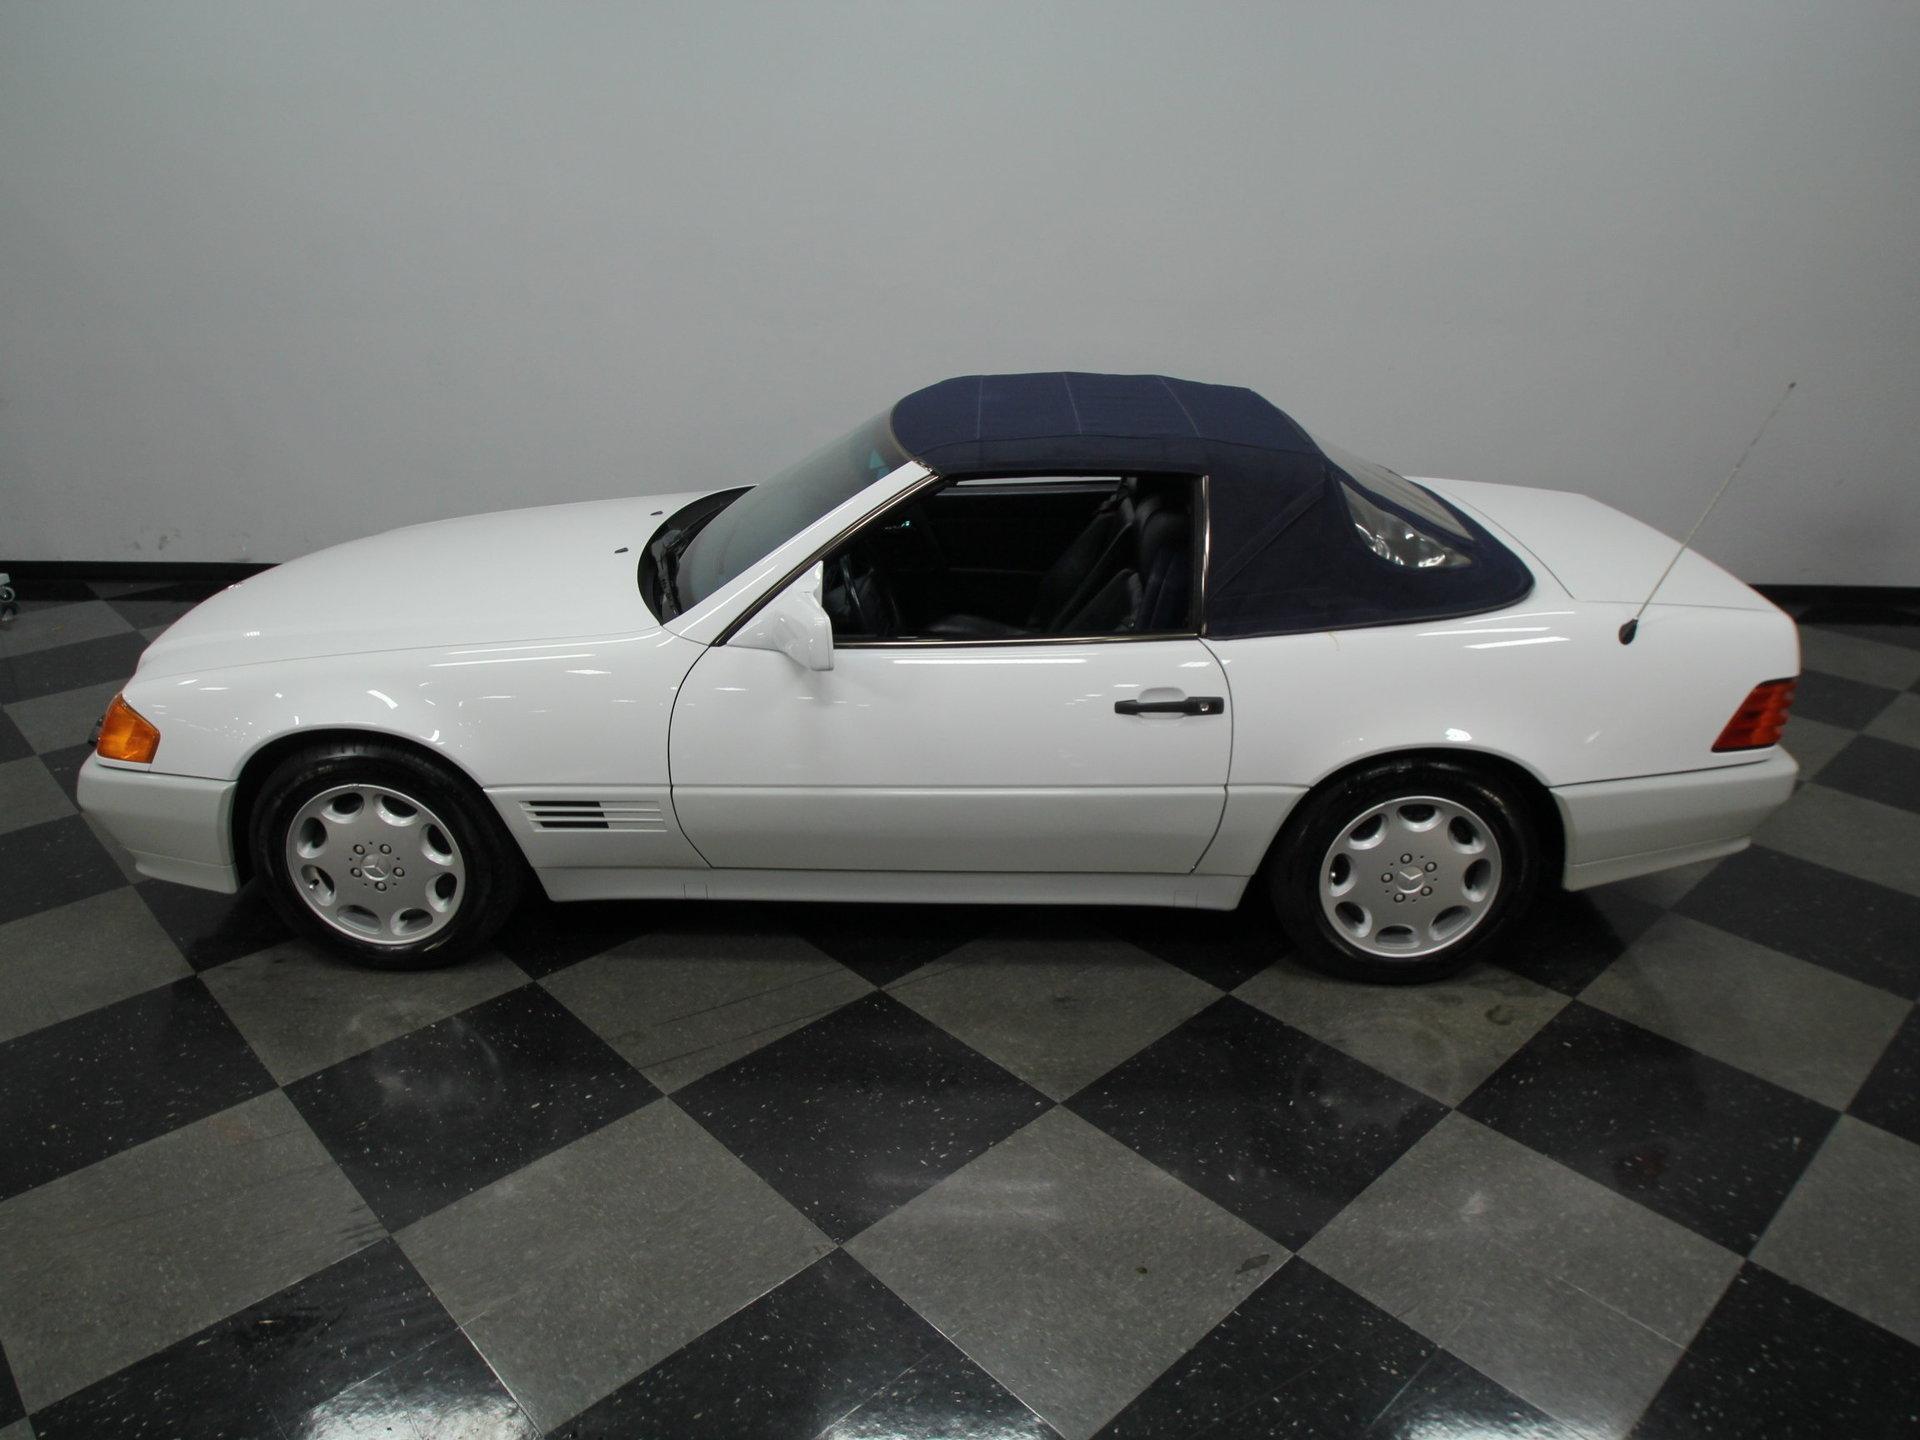 ... 1992 Mercedes-Benz 500SL. Spincar view. Play Video. View 360